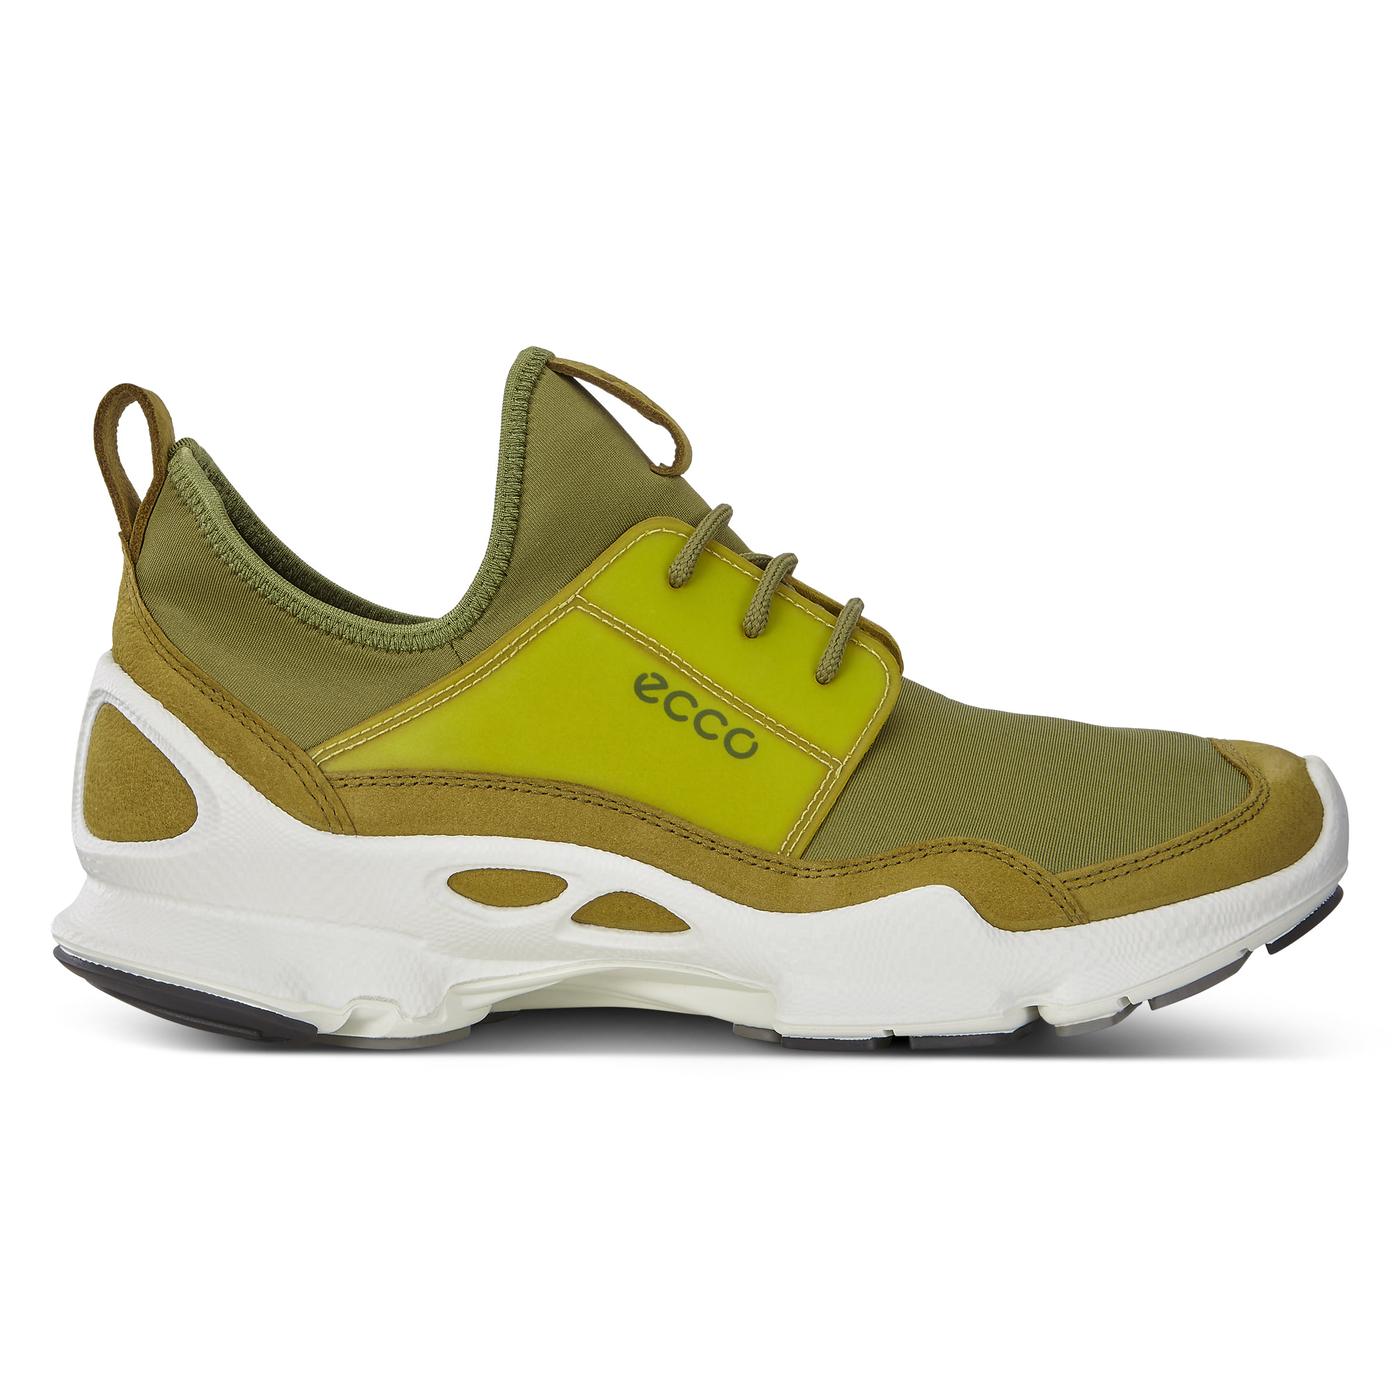 ECCO 남성 스포츠슈즈 바이옴 C 800304